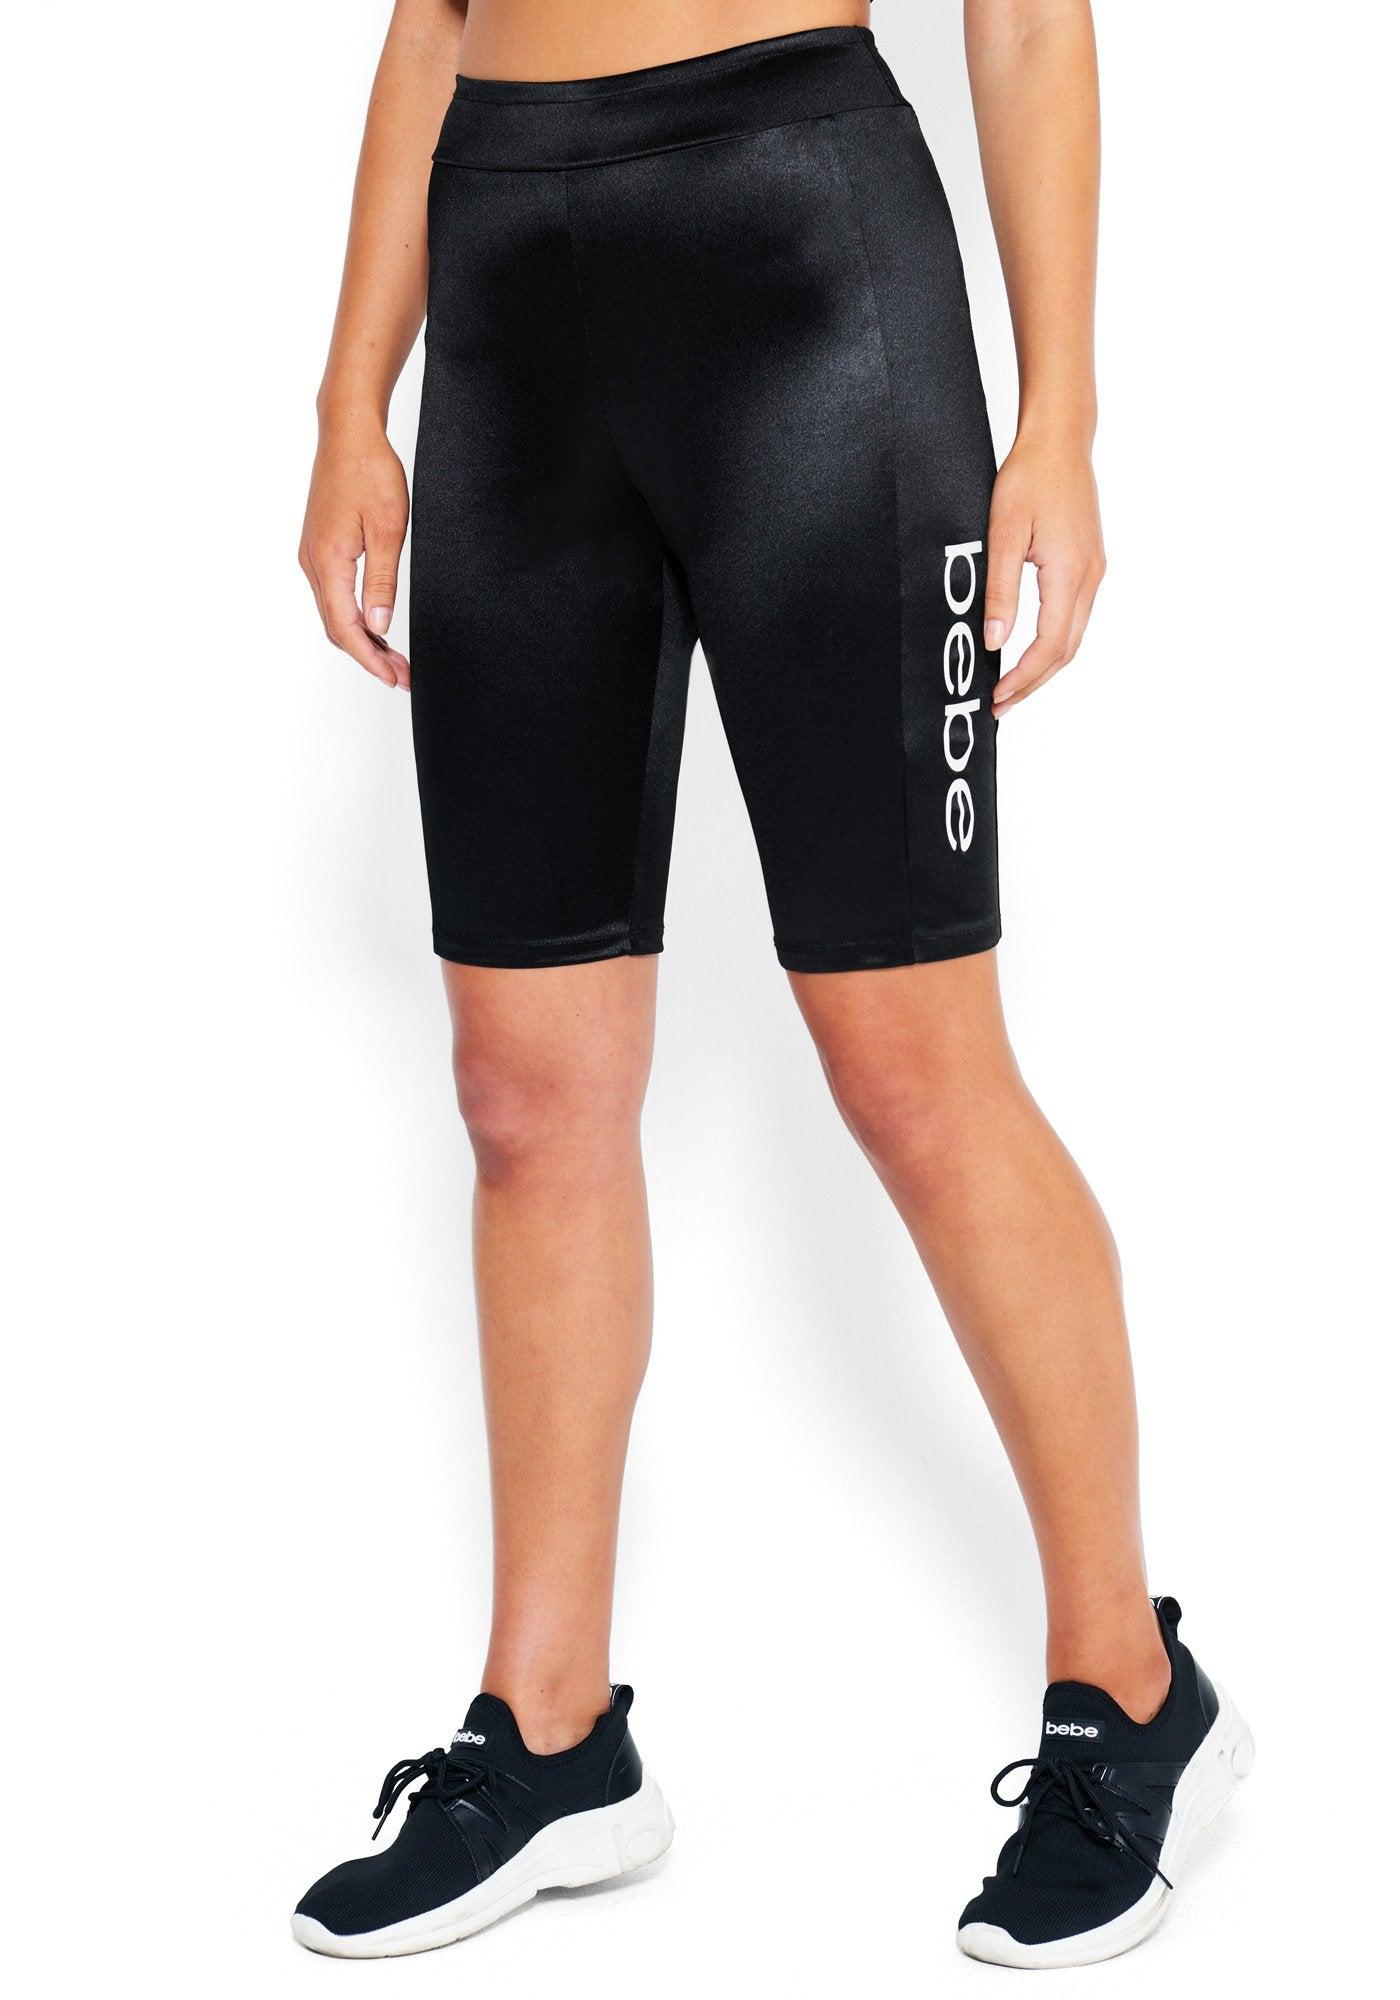 bebe Women's Mya Bebe Logo Bike Shorts, Size XXS in Black Spandex